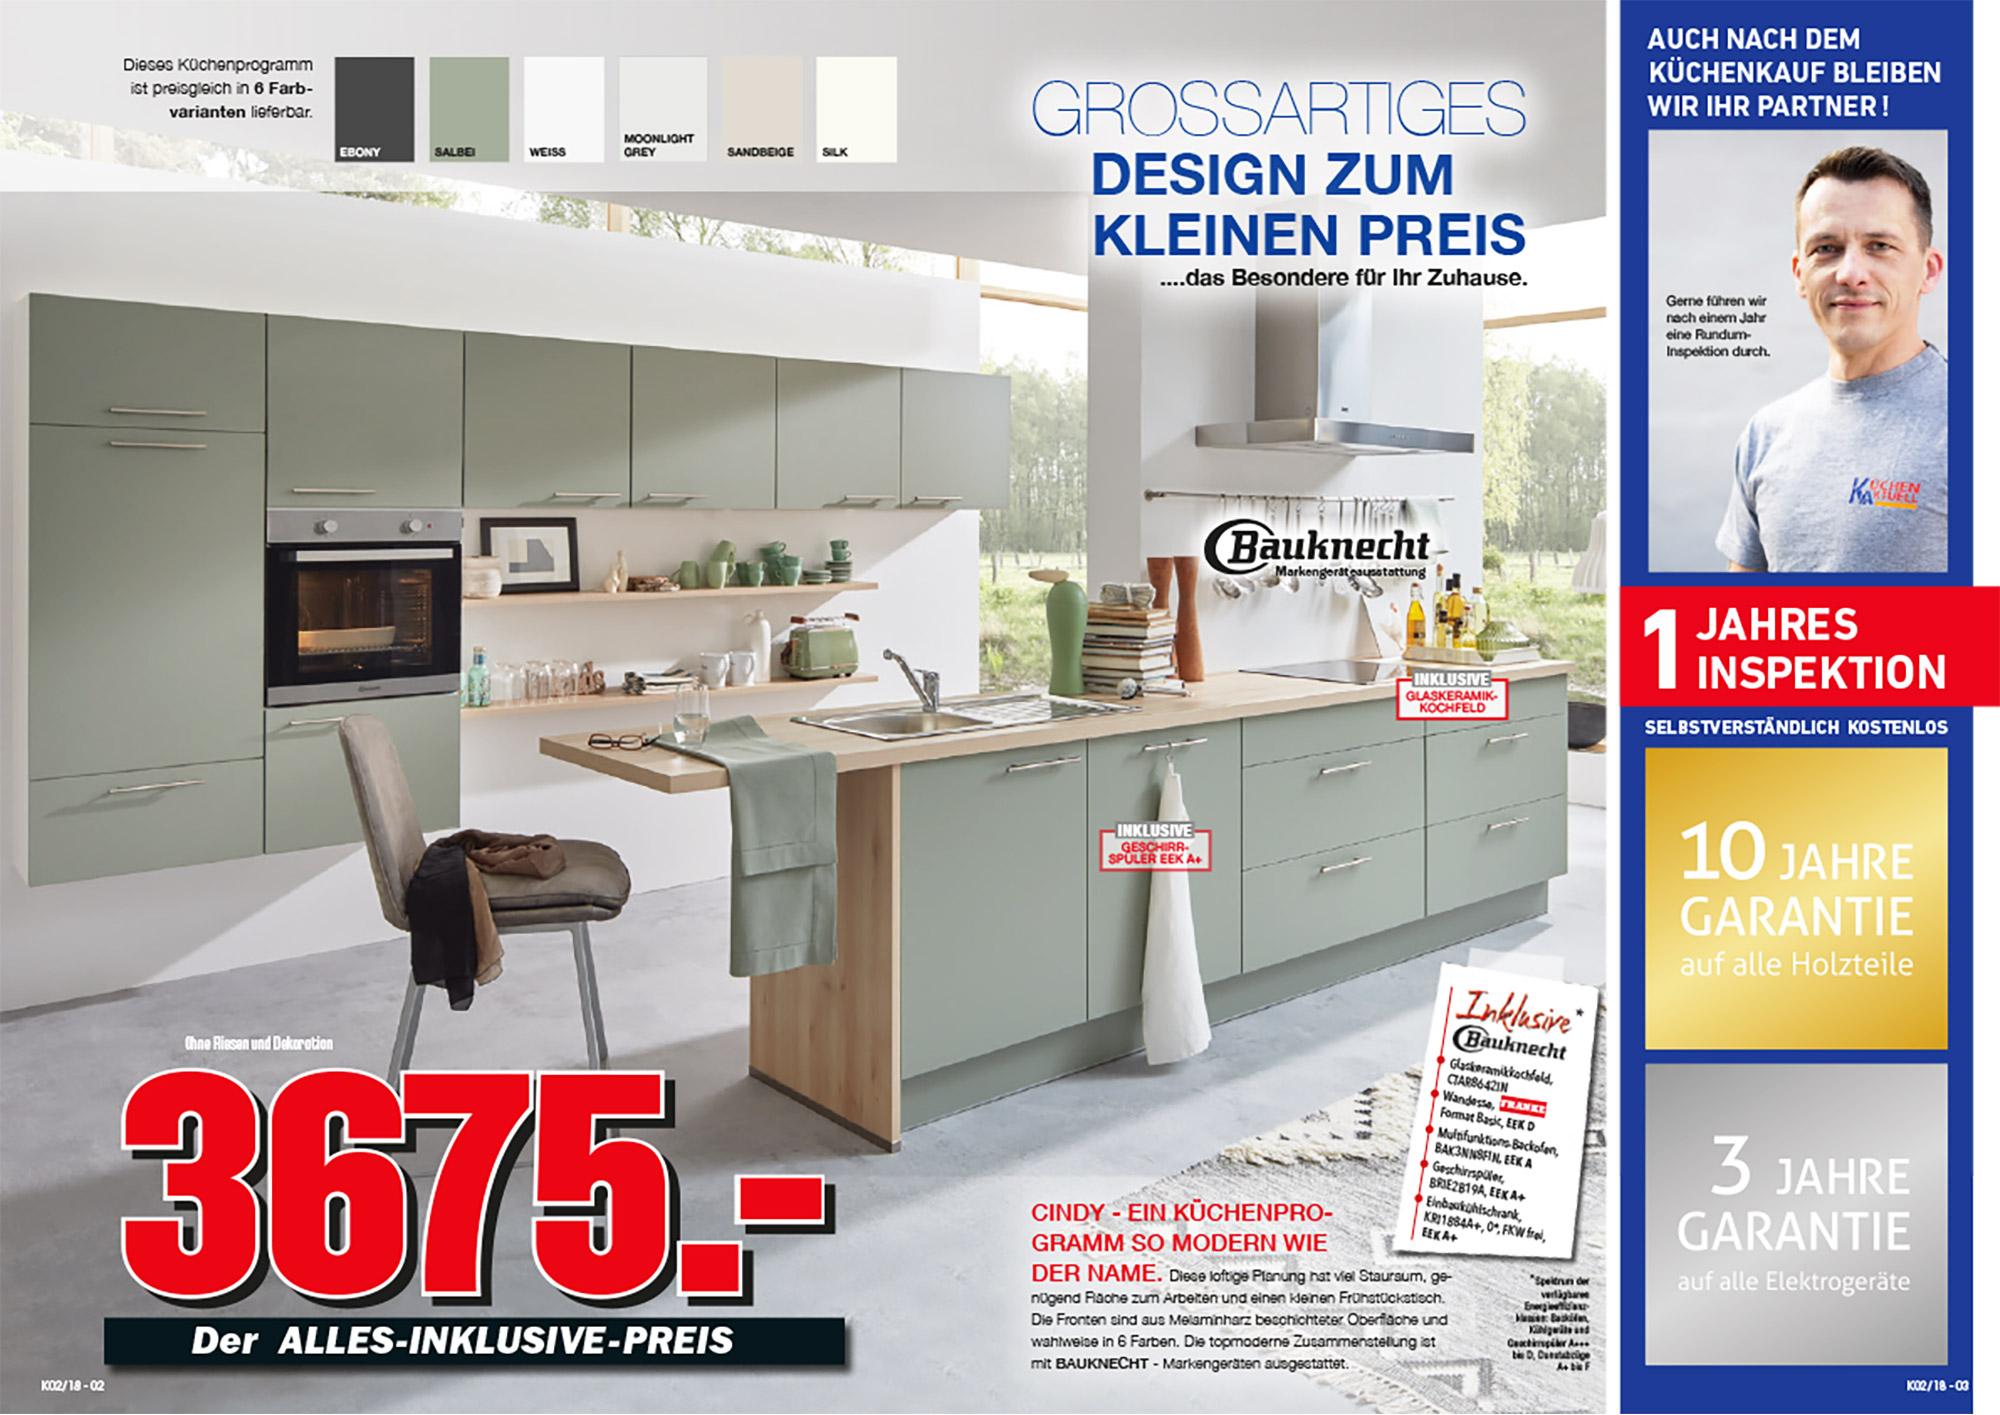 mbel hffner kchen prospekt perfect hffner kchen prospekt with mbel hffner kchen prospekt. Black Bedroom Furniture Sets. Home Design Ideas